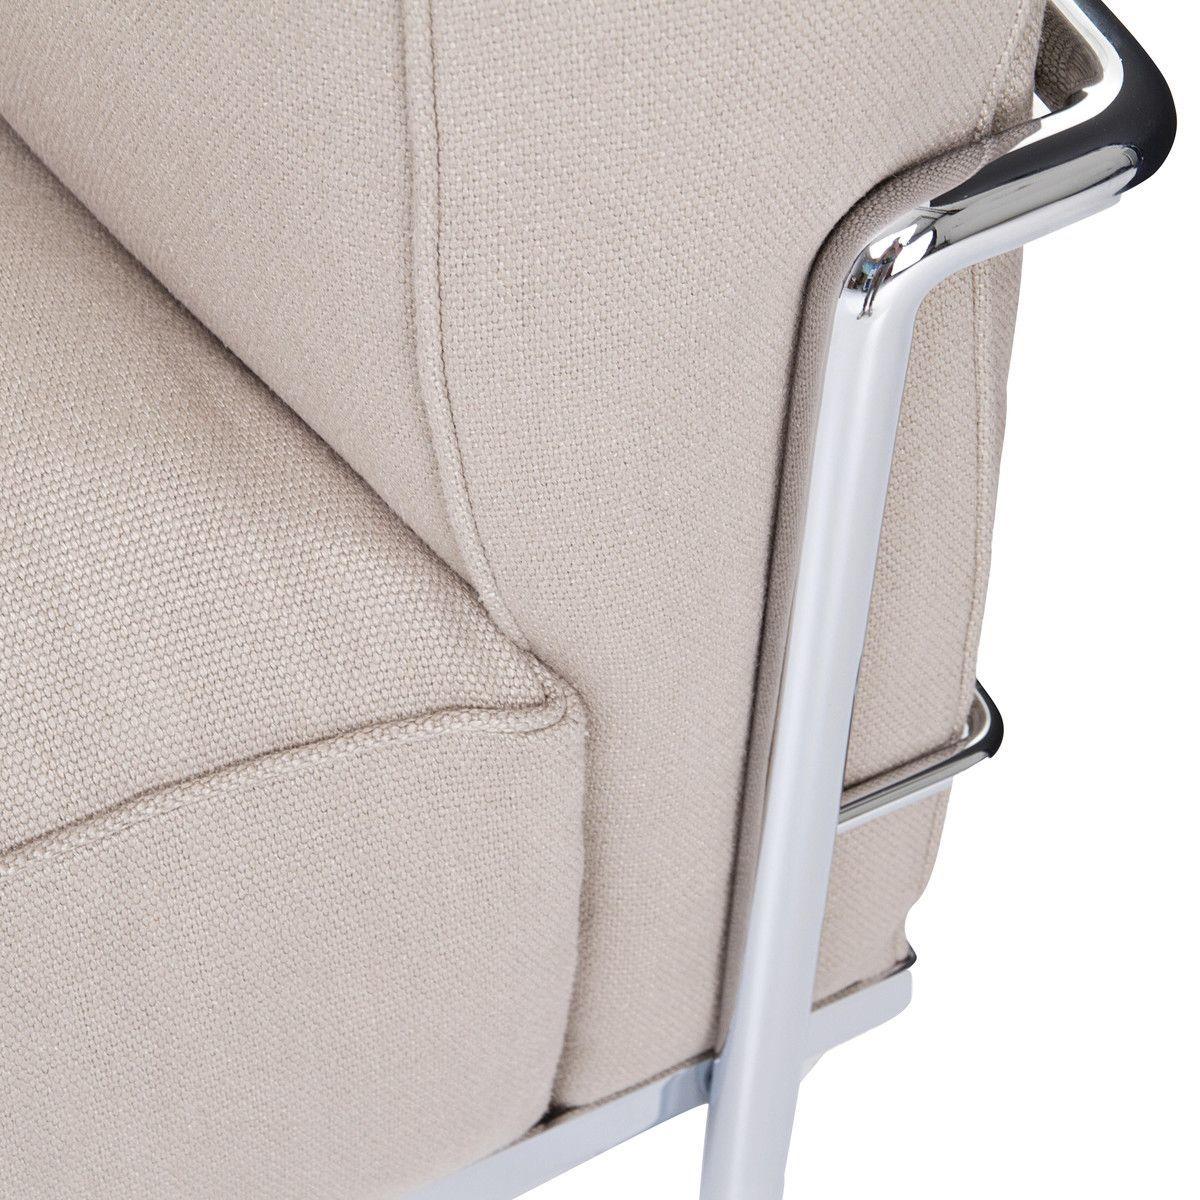 le corbusier lc3 sessel cassina cassina sofa klassiker klassiker. Black Bedroom Furniture Sets. Home Design Ideas